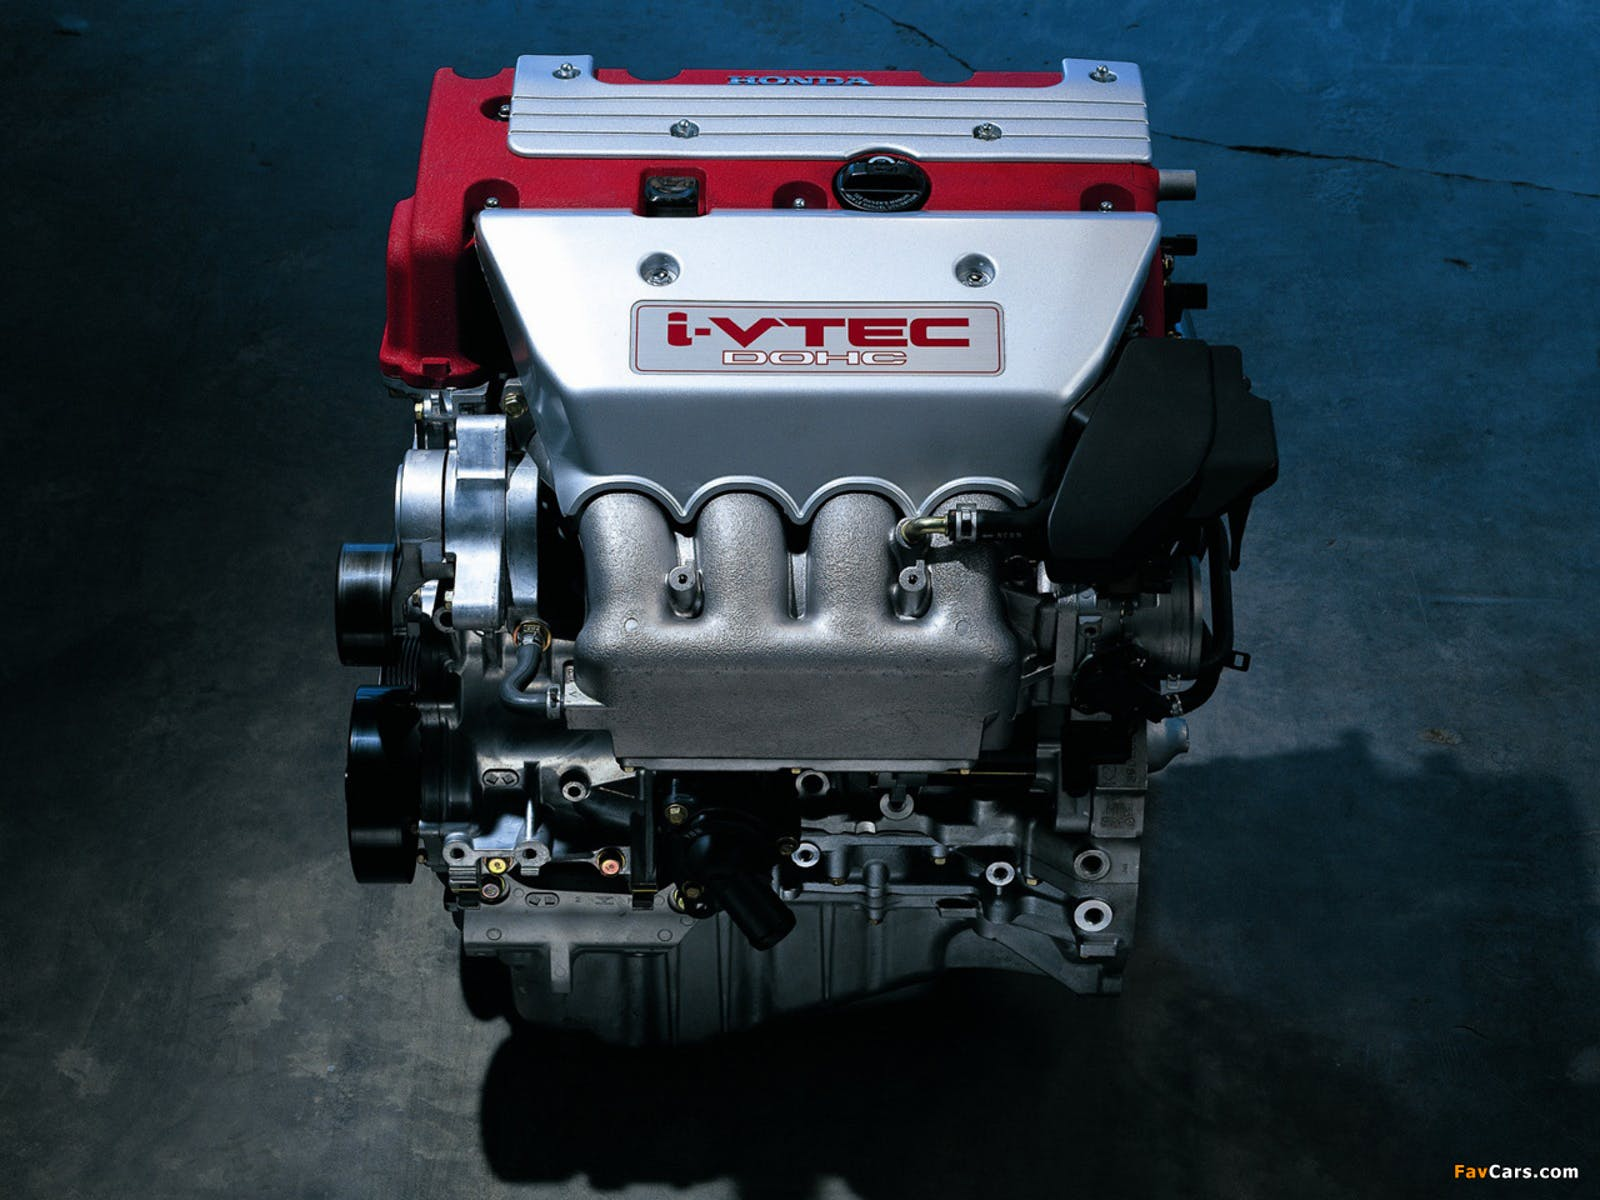 Honda JDM engines are legendary